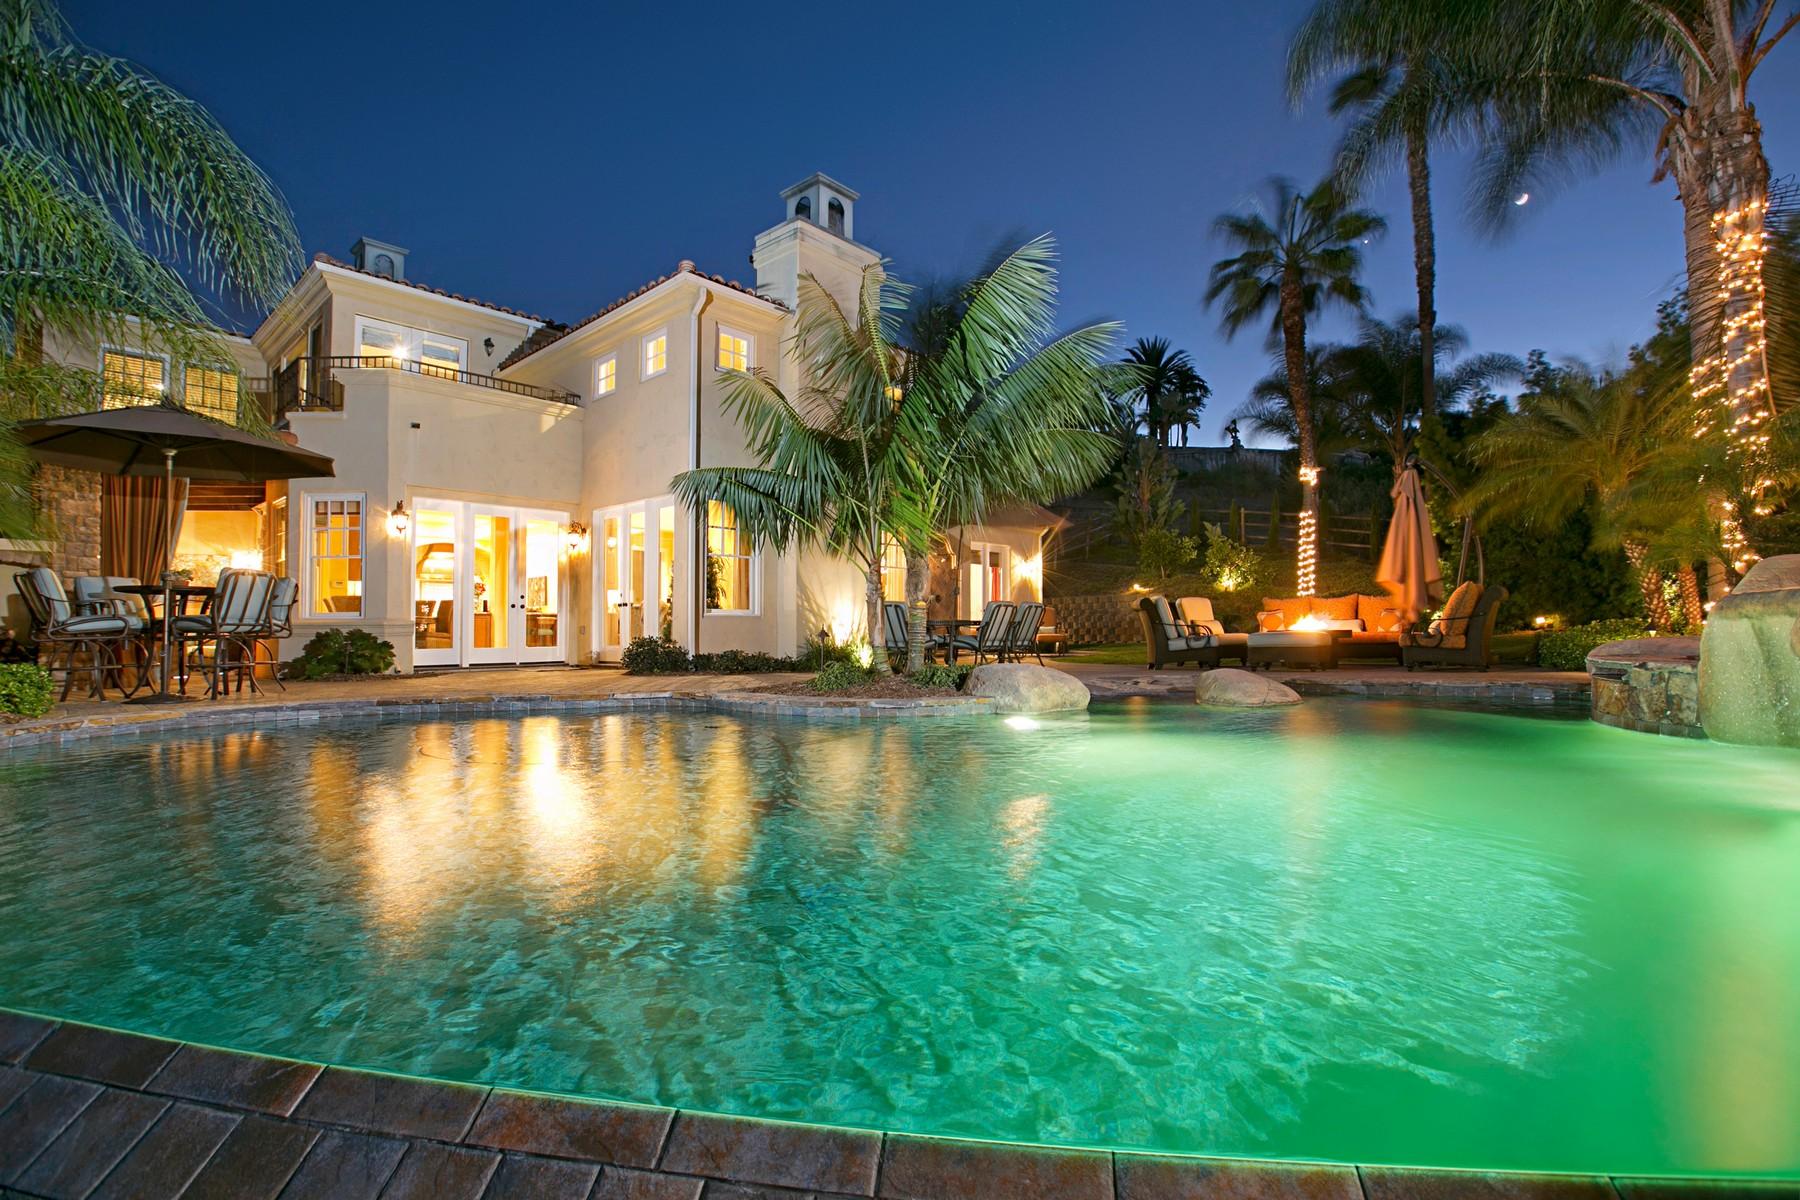 Villa per Vendita alle ore 3376 Calle Tres Vistas Encinitas, California, 92024 Stati Uniti